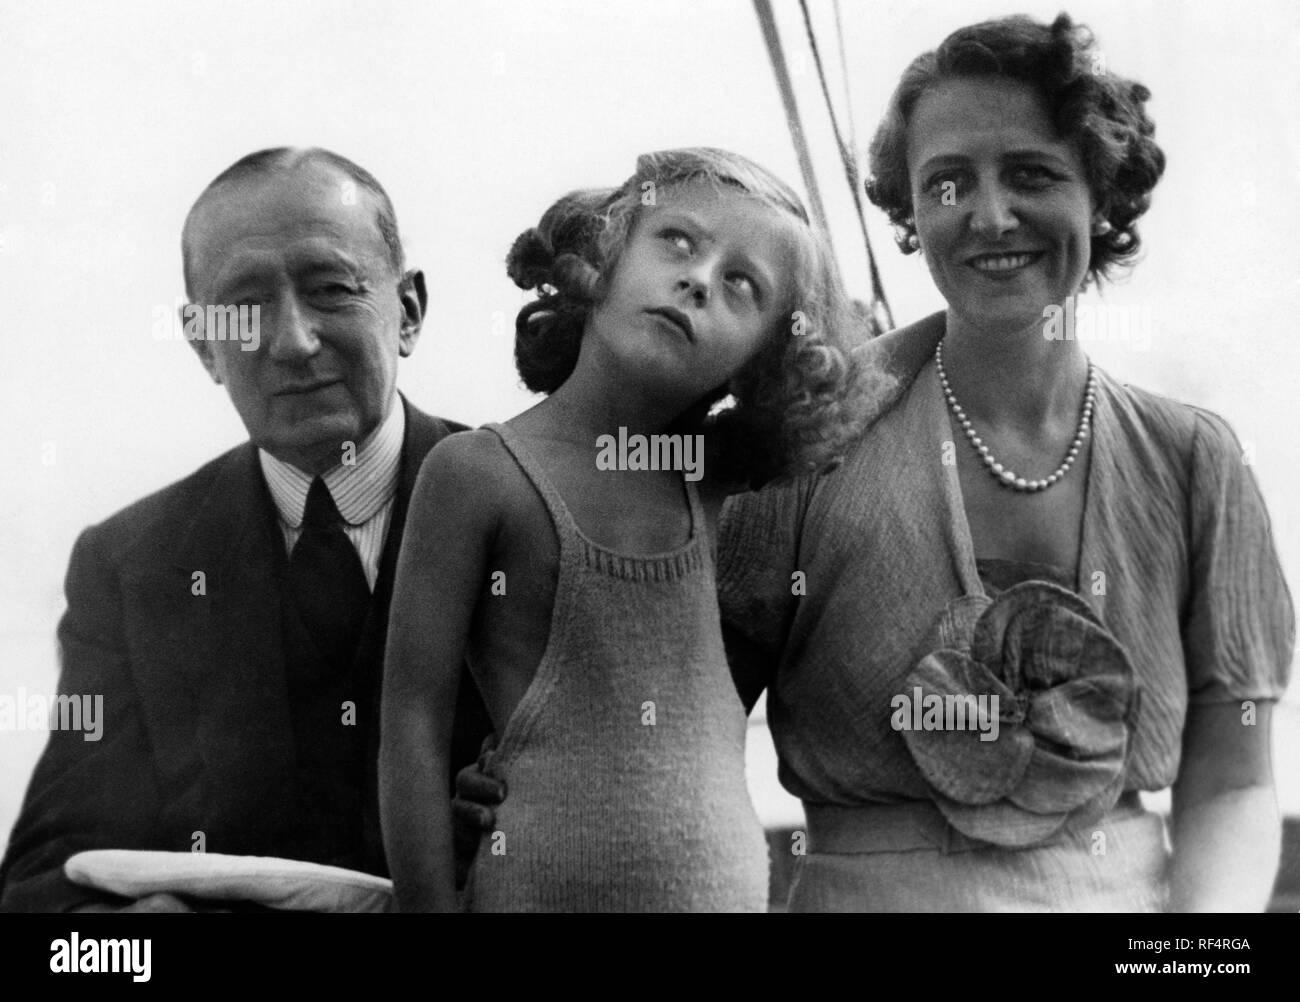 Elettra Marconi und Familie, 1936 Stockfoto